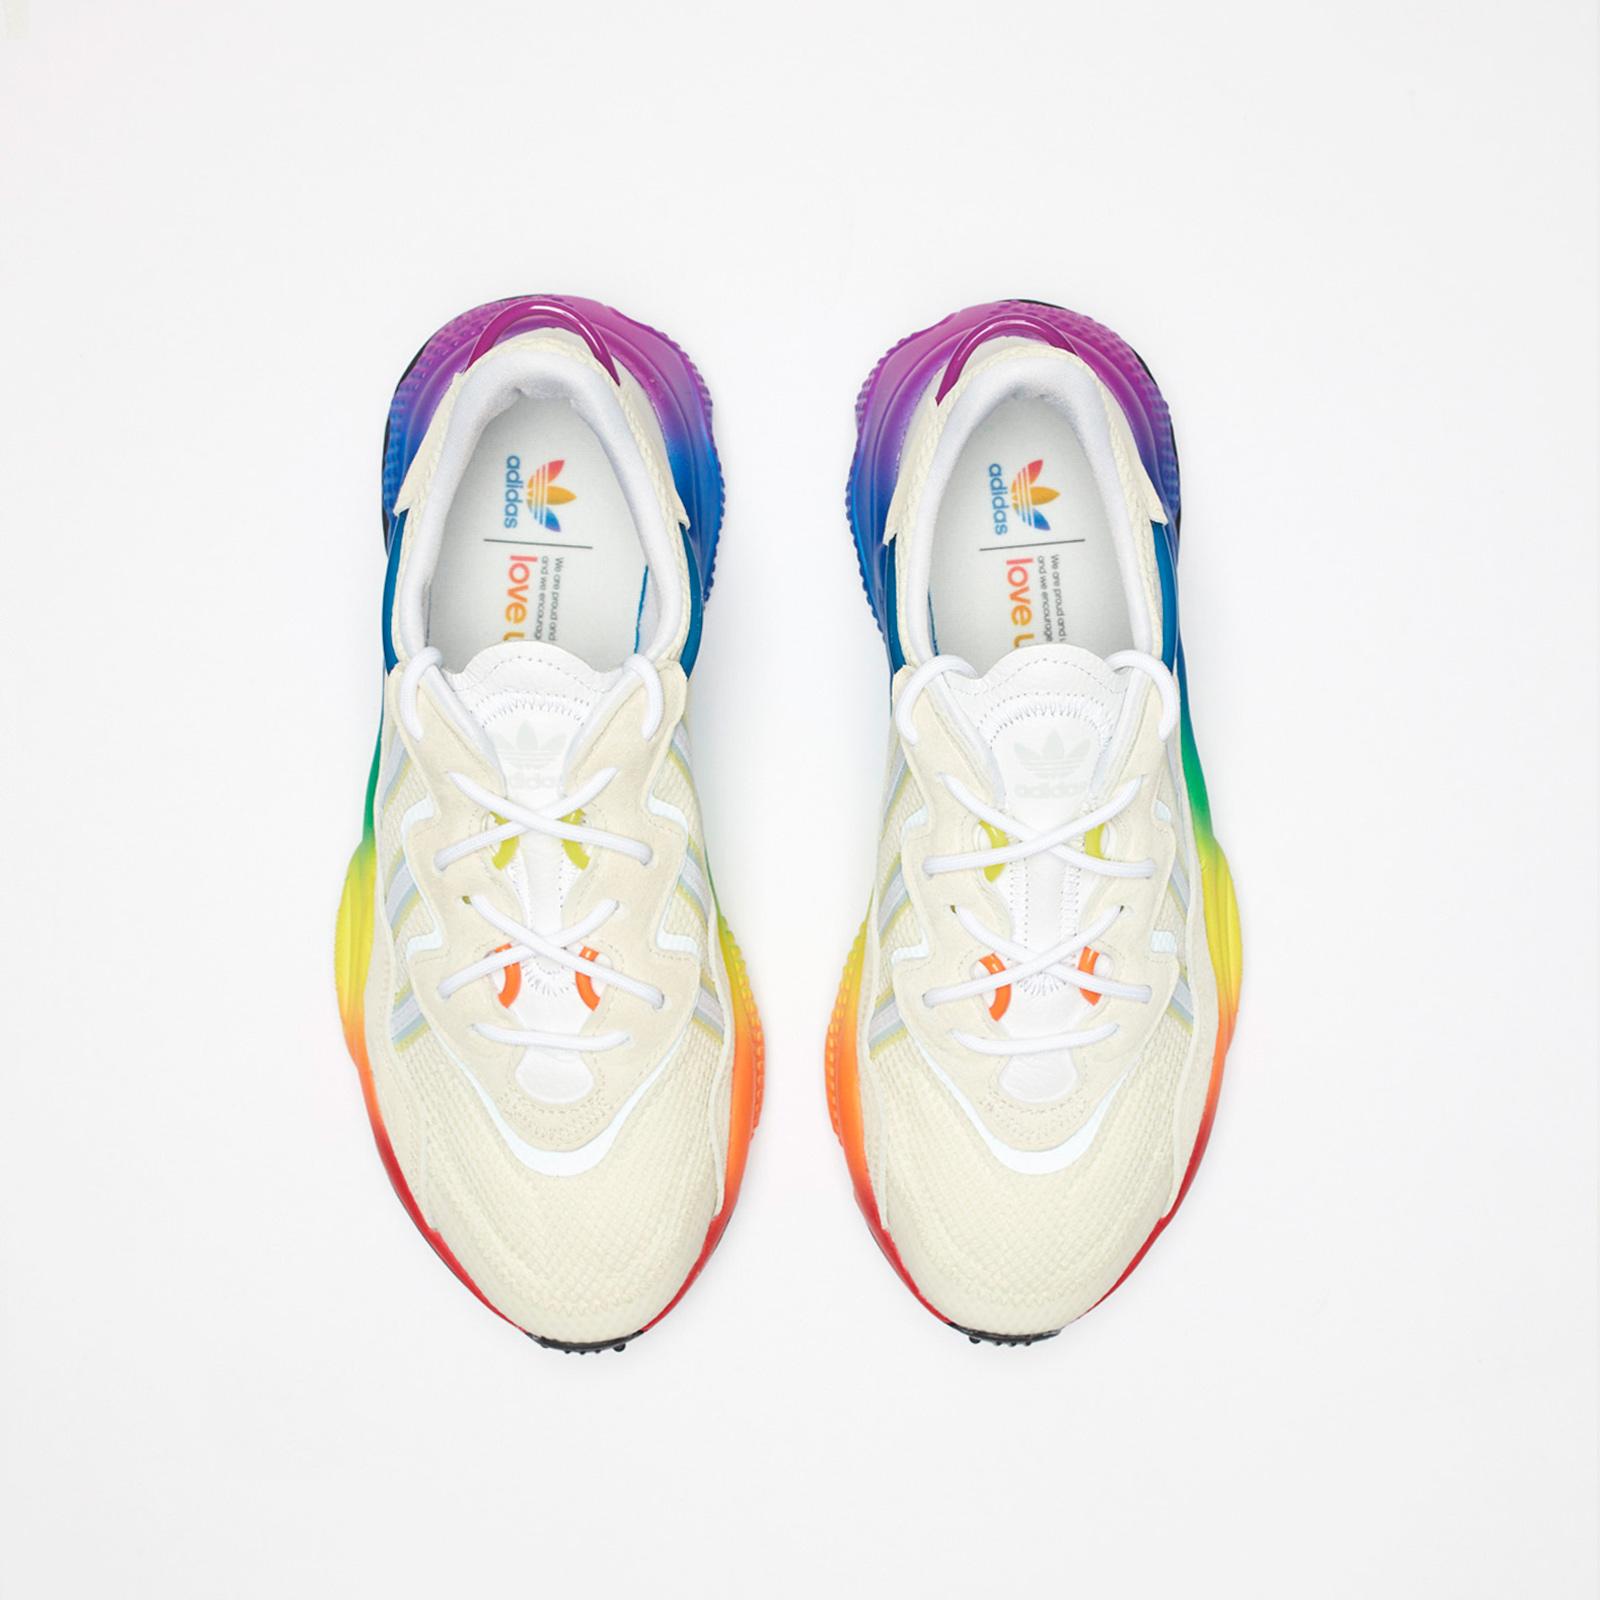 adidas Ozweego Pride - Eg1076